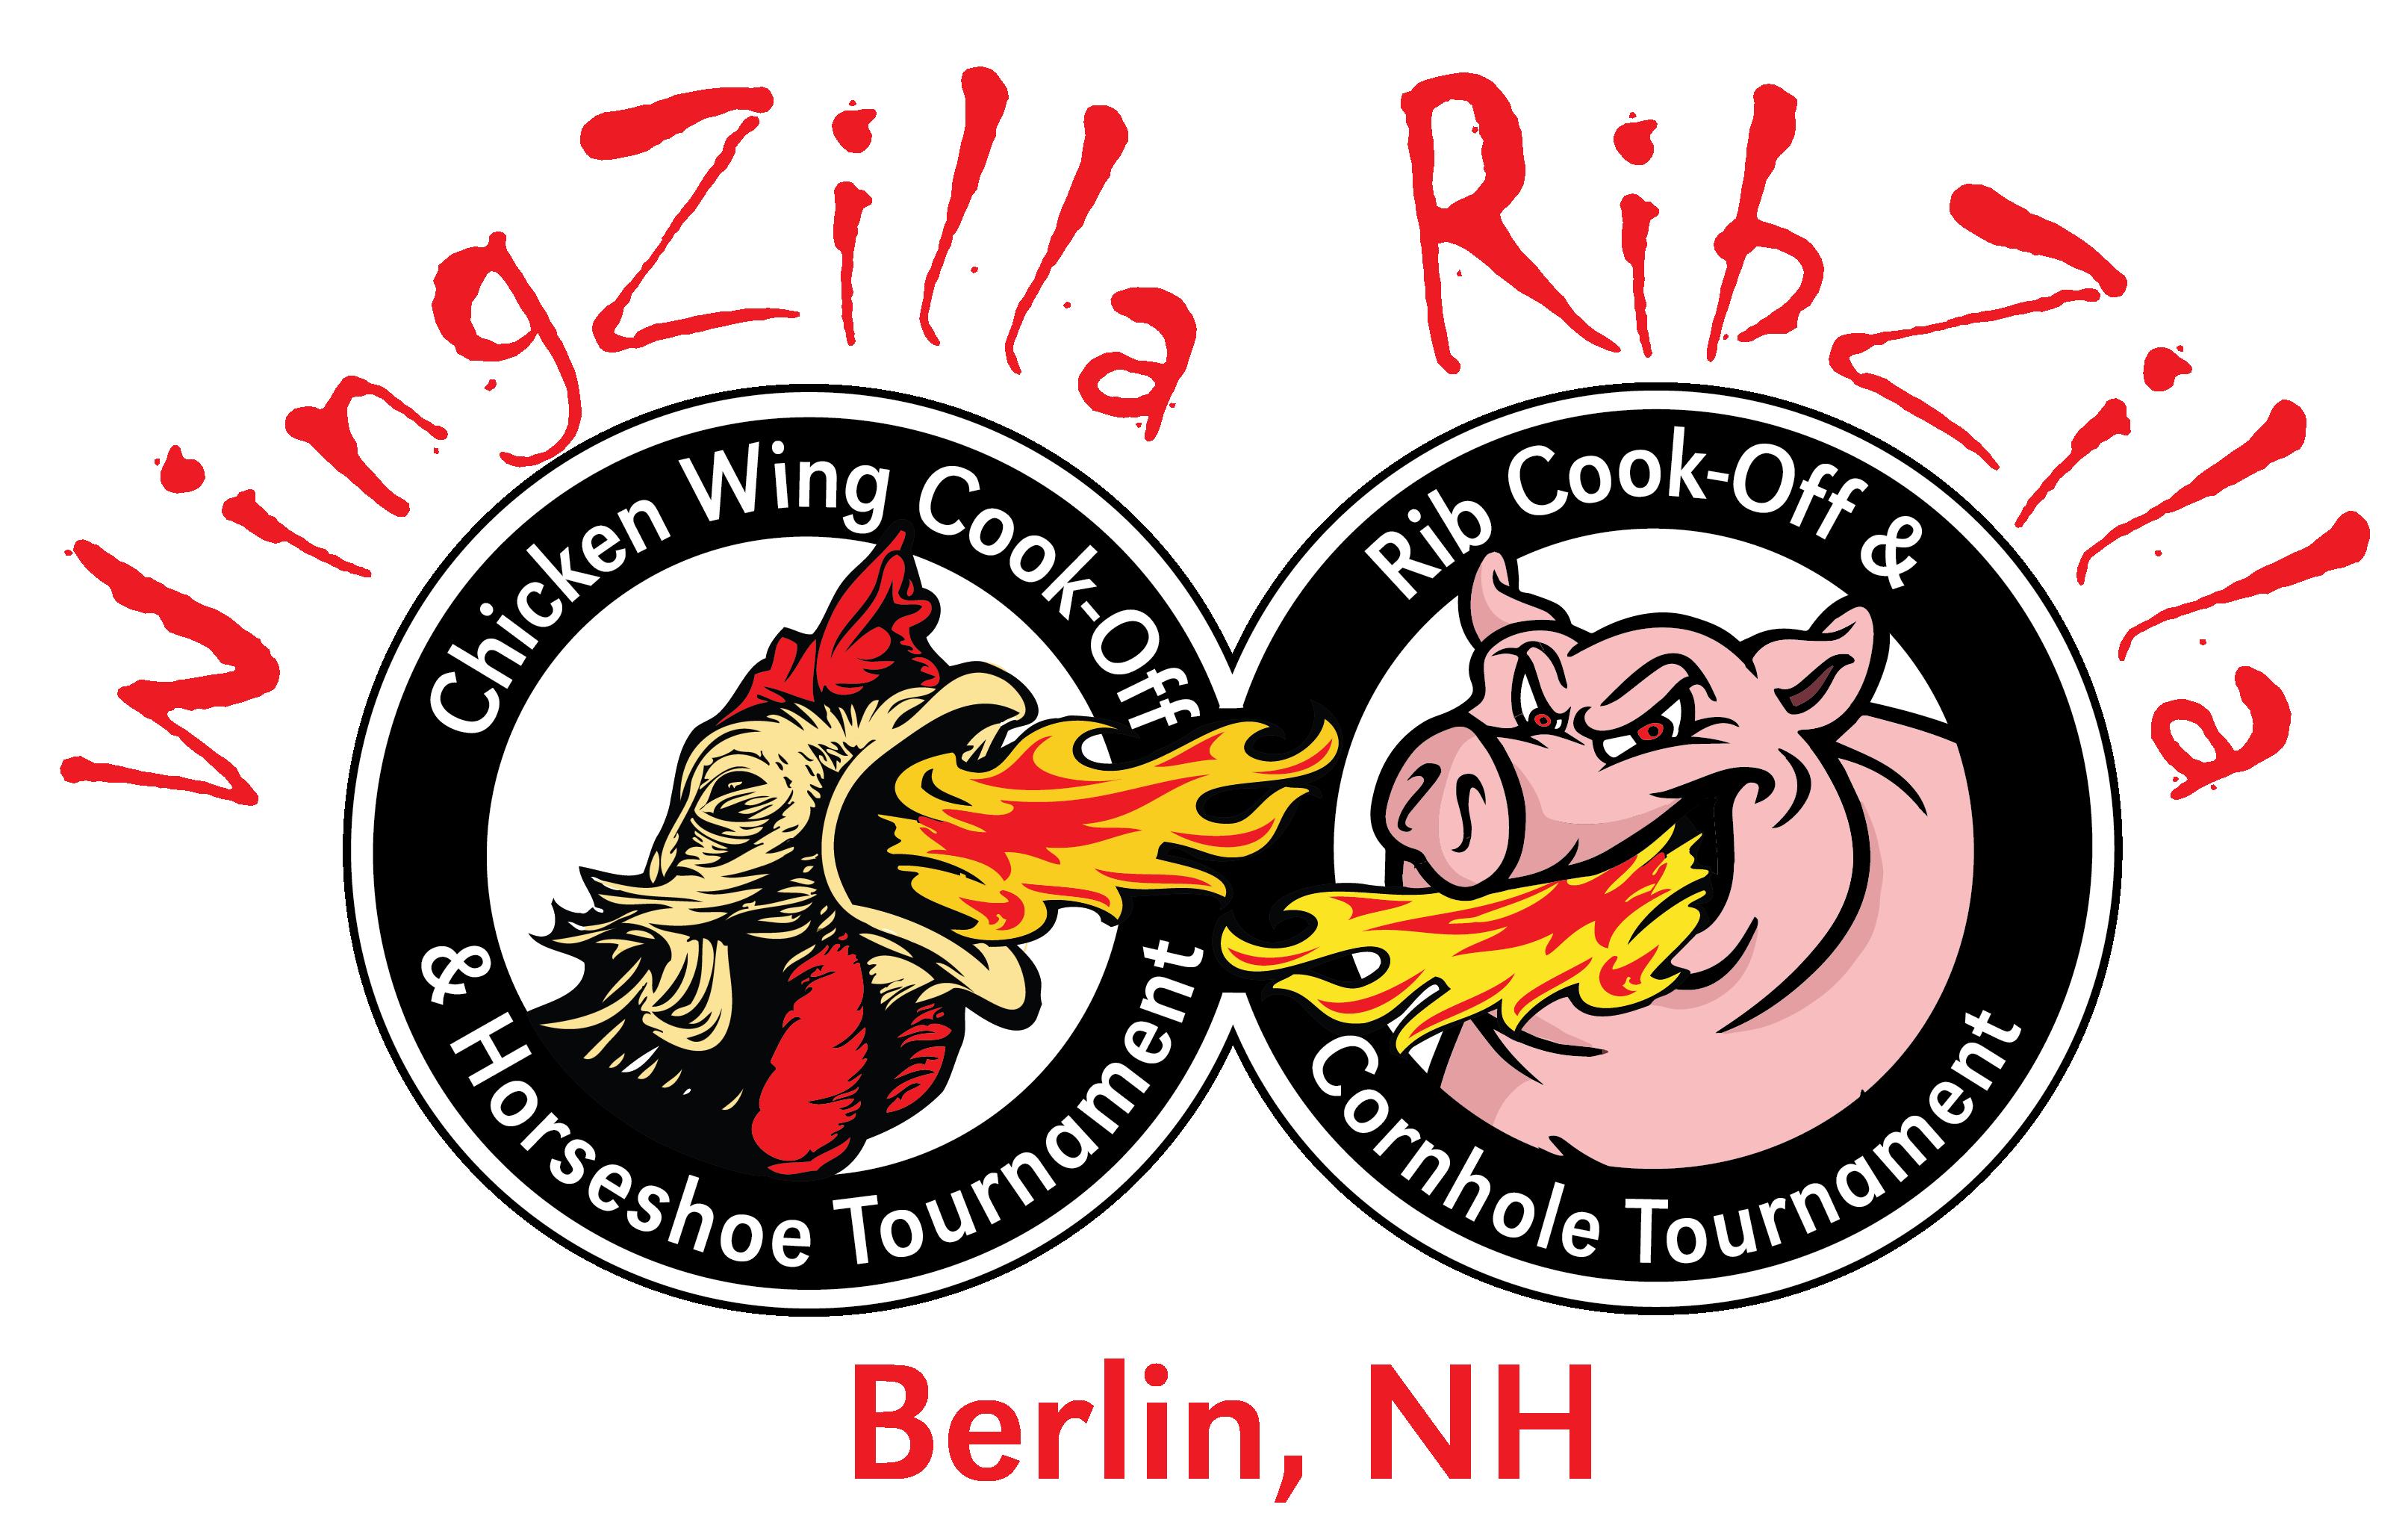 Wingzilla Ribzilla logo